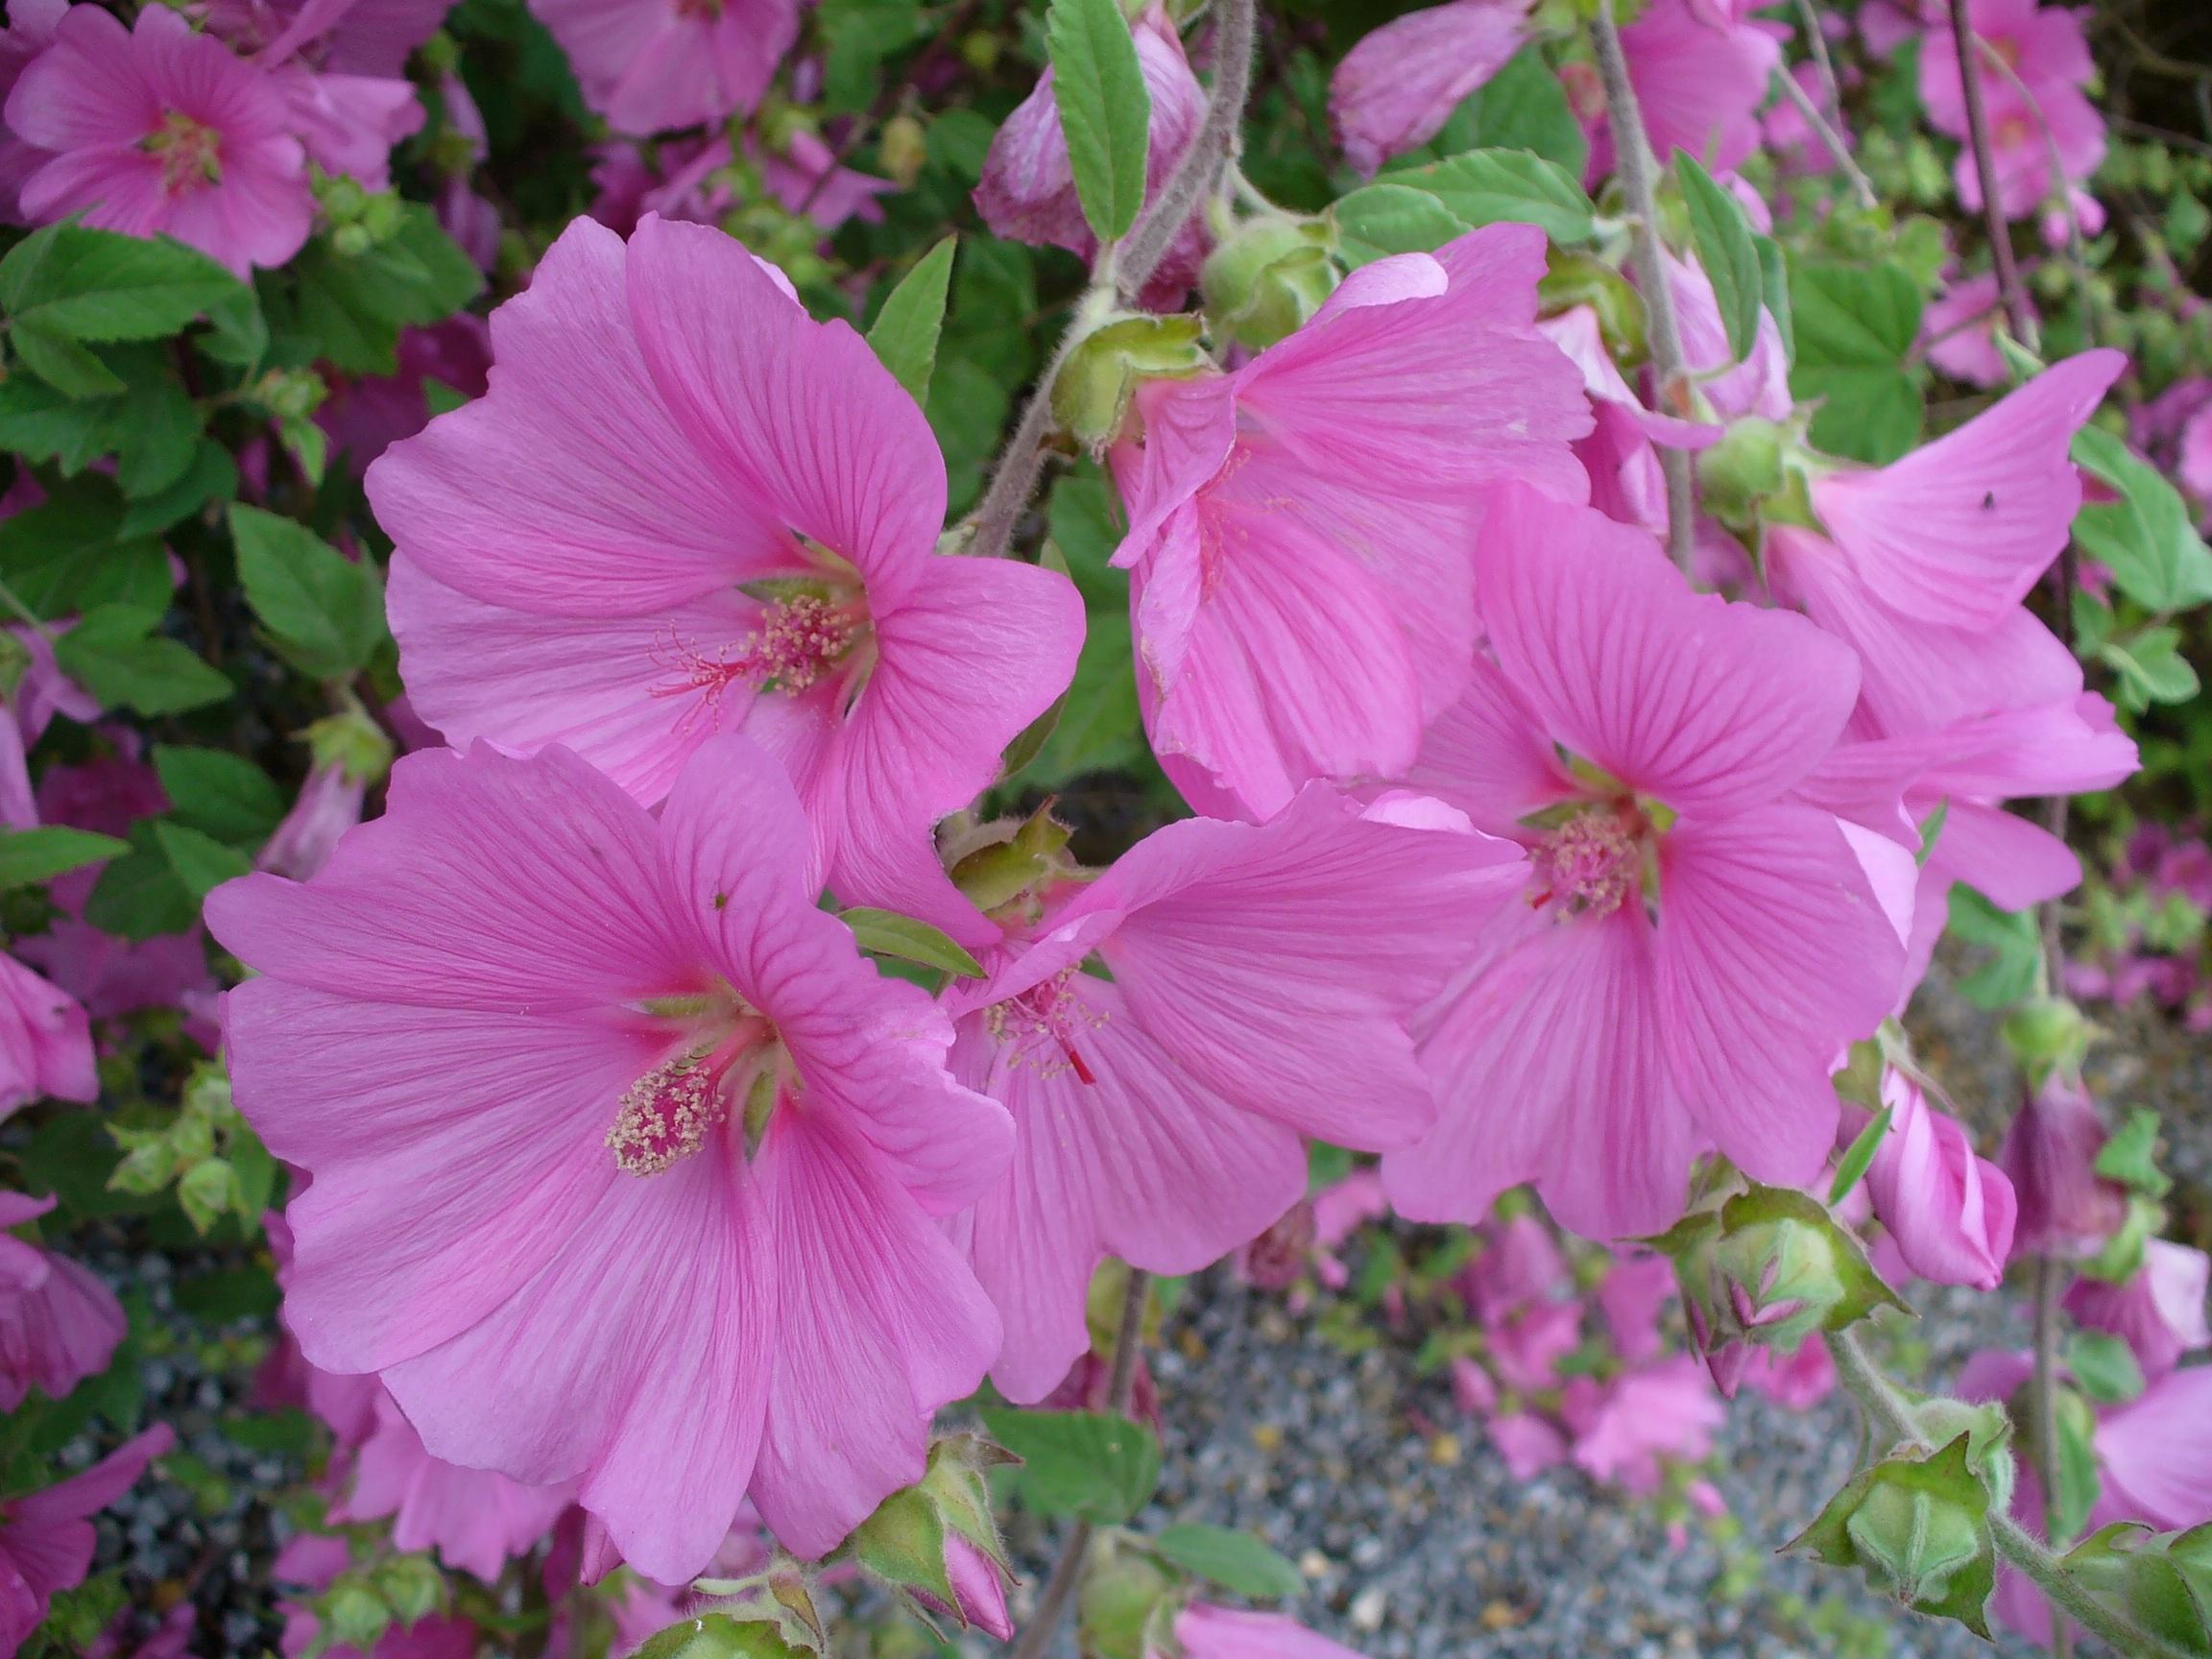 Free Images Nature Flower Petal Flora Malva Hollyhocks